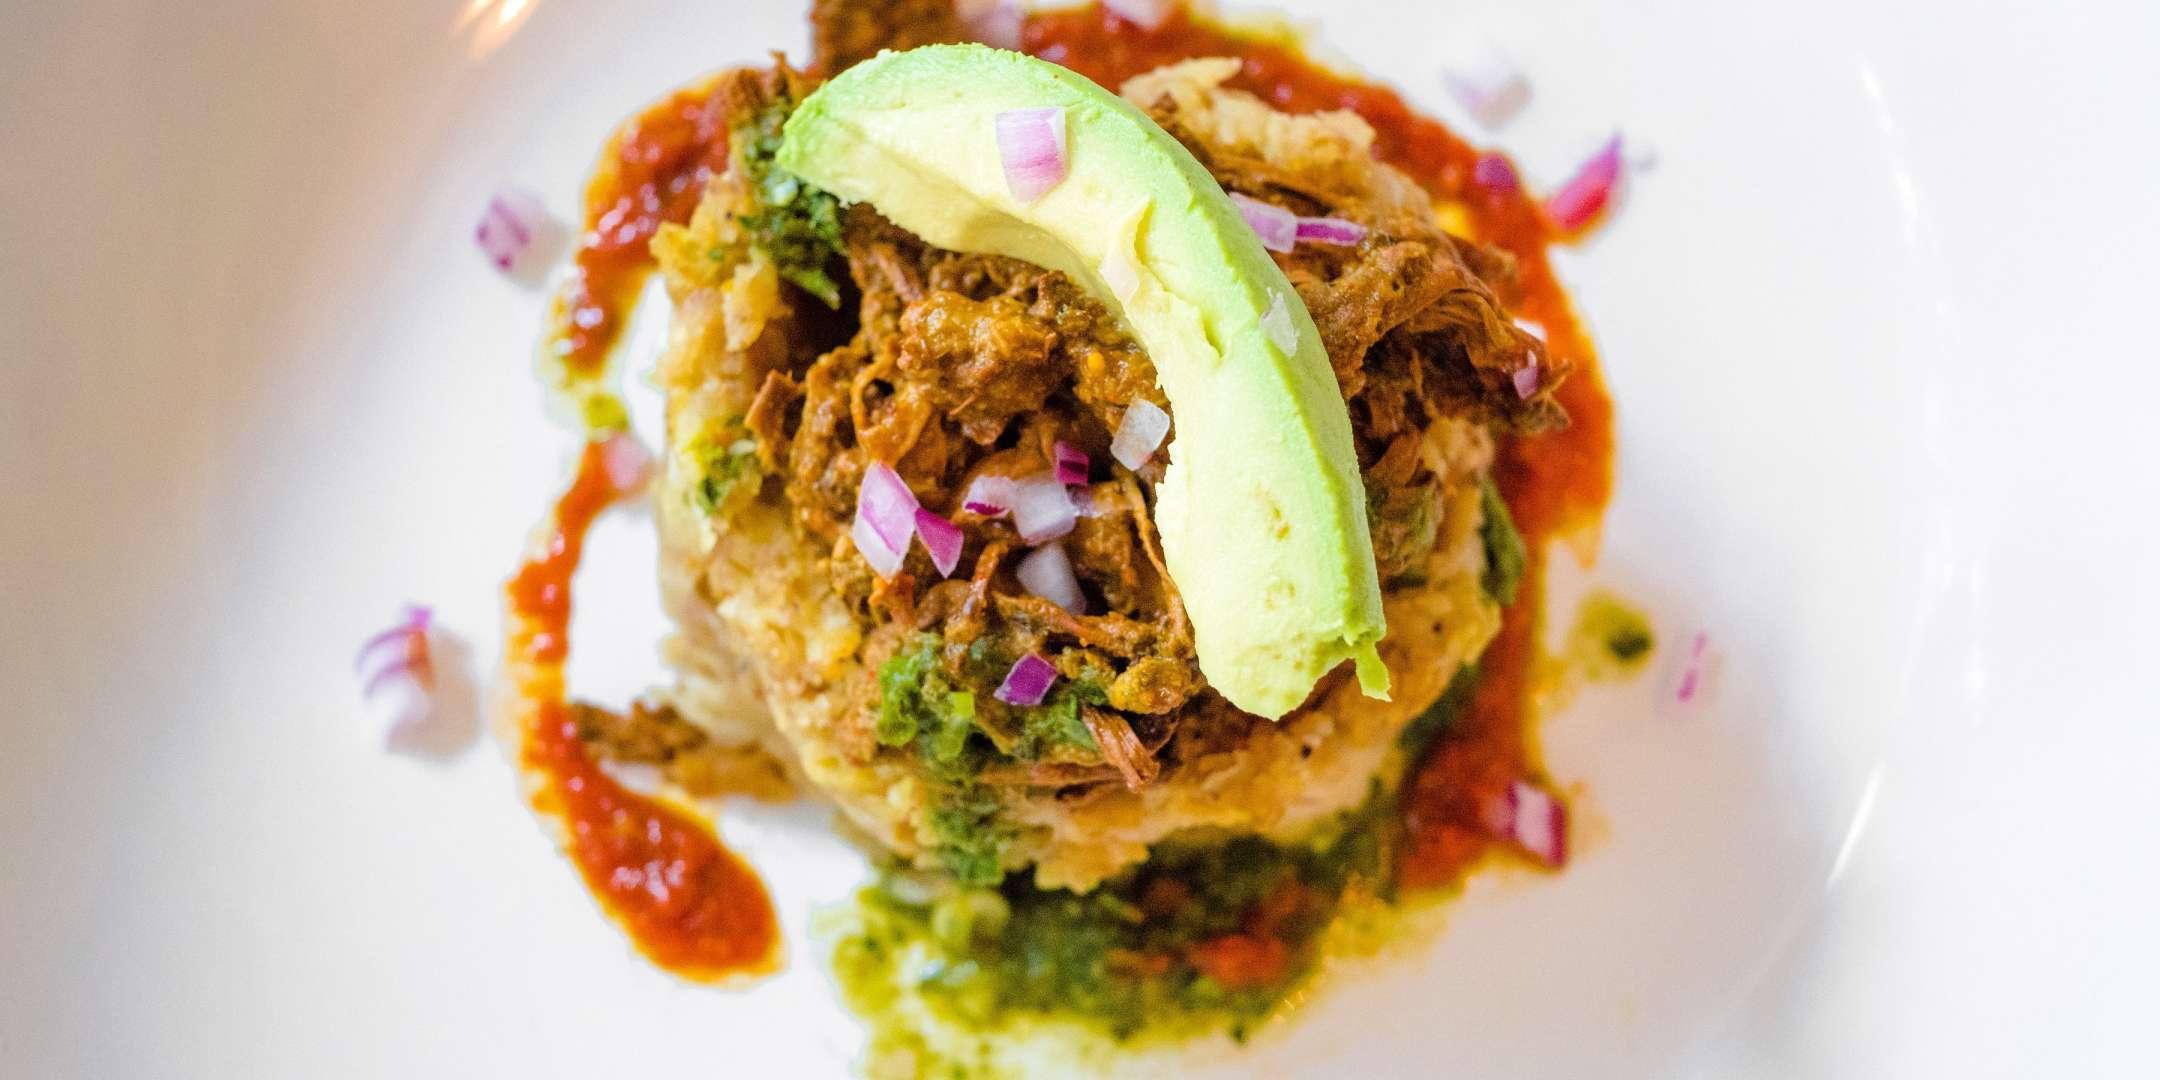 Latin Cuisine Techniques - Team Building by Cozymeal™